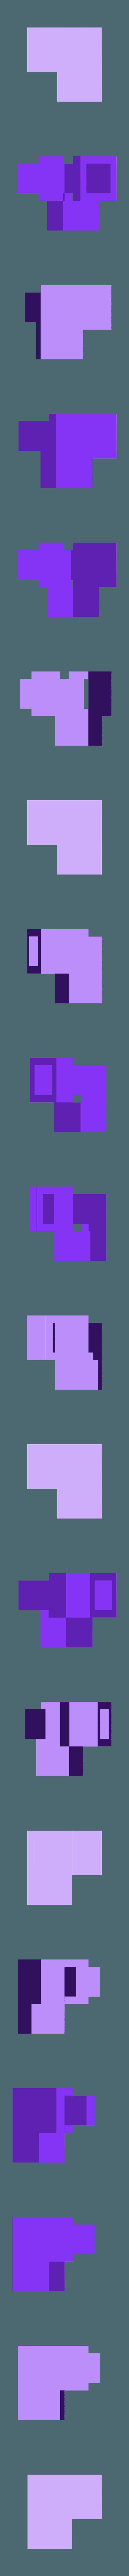 Porte_pots_de_fleurs_fen%C3%AAtre_-_Angle.stl Download free STL file Flowerpot holder / Flowerpot holder • 3D print object, BakoProductions